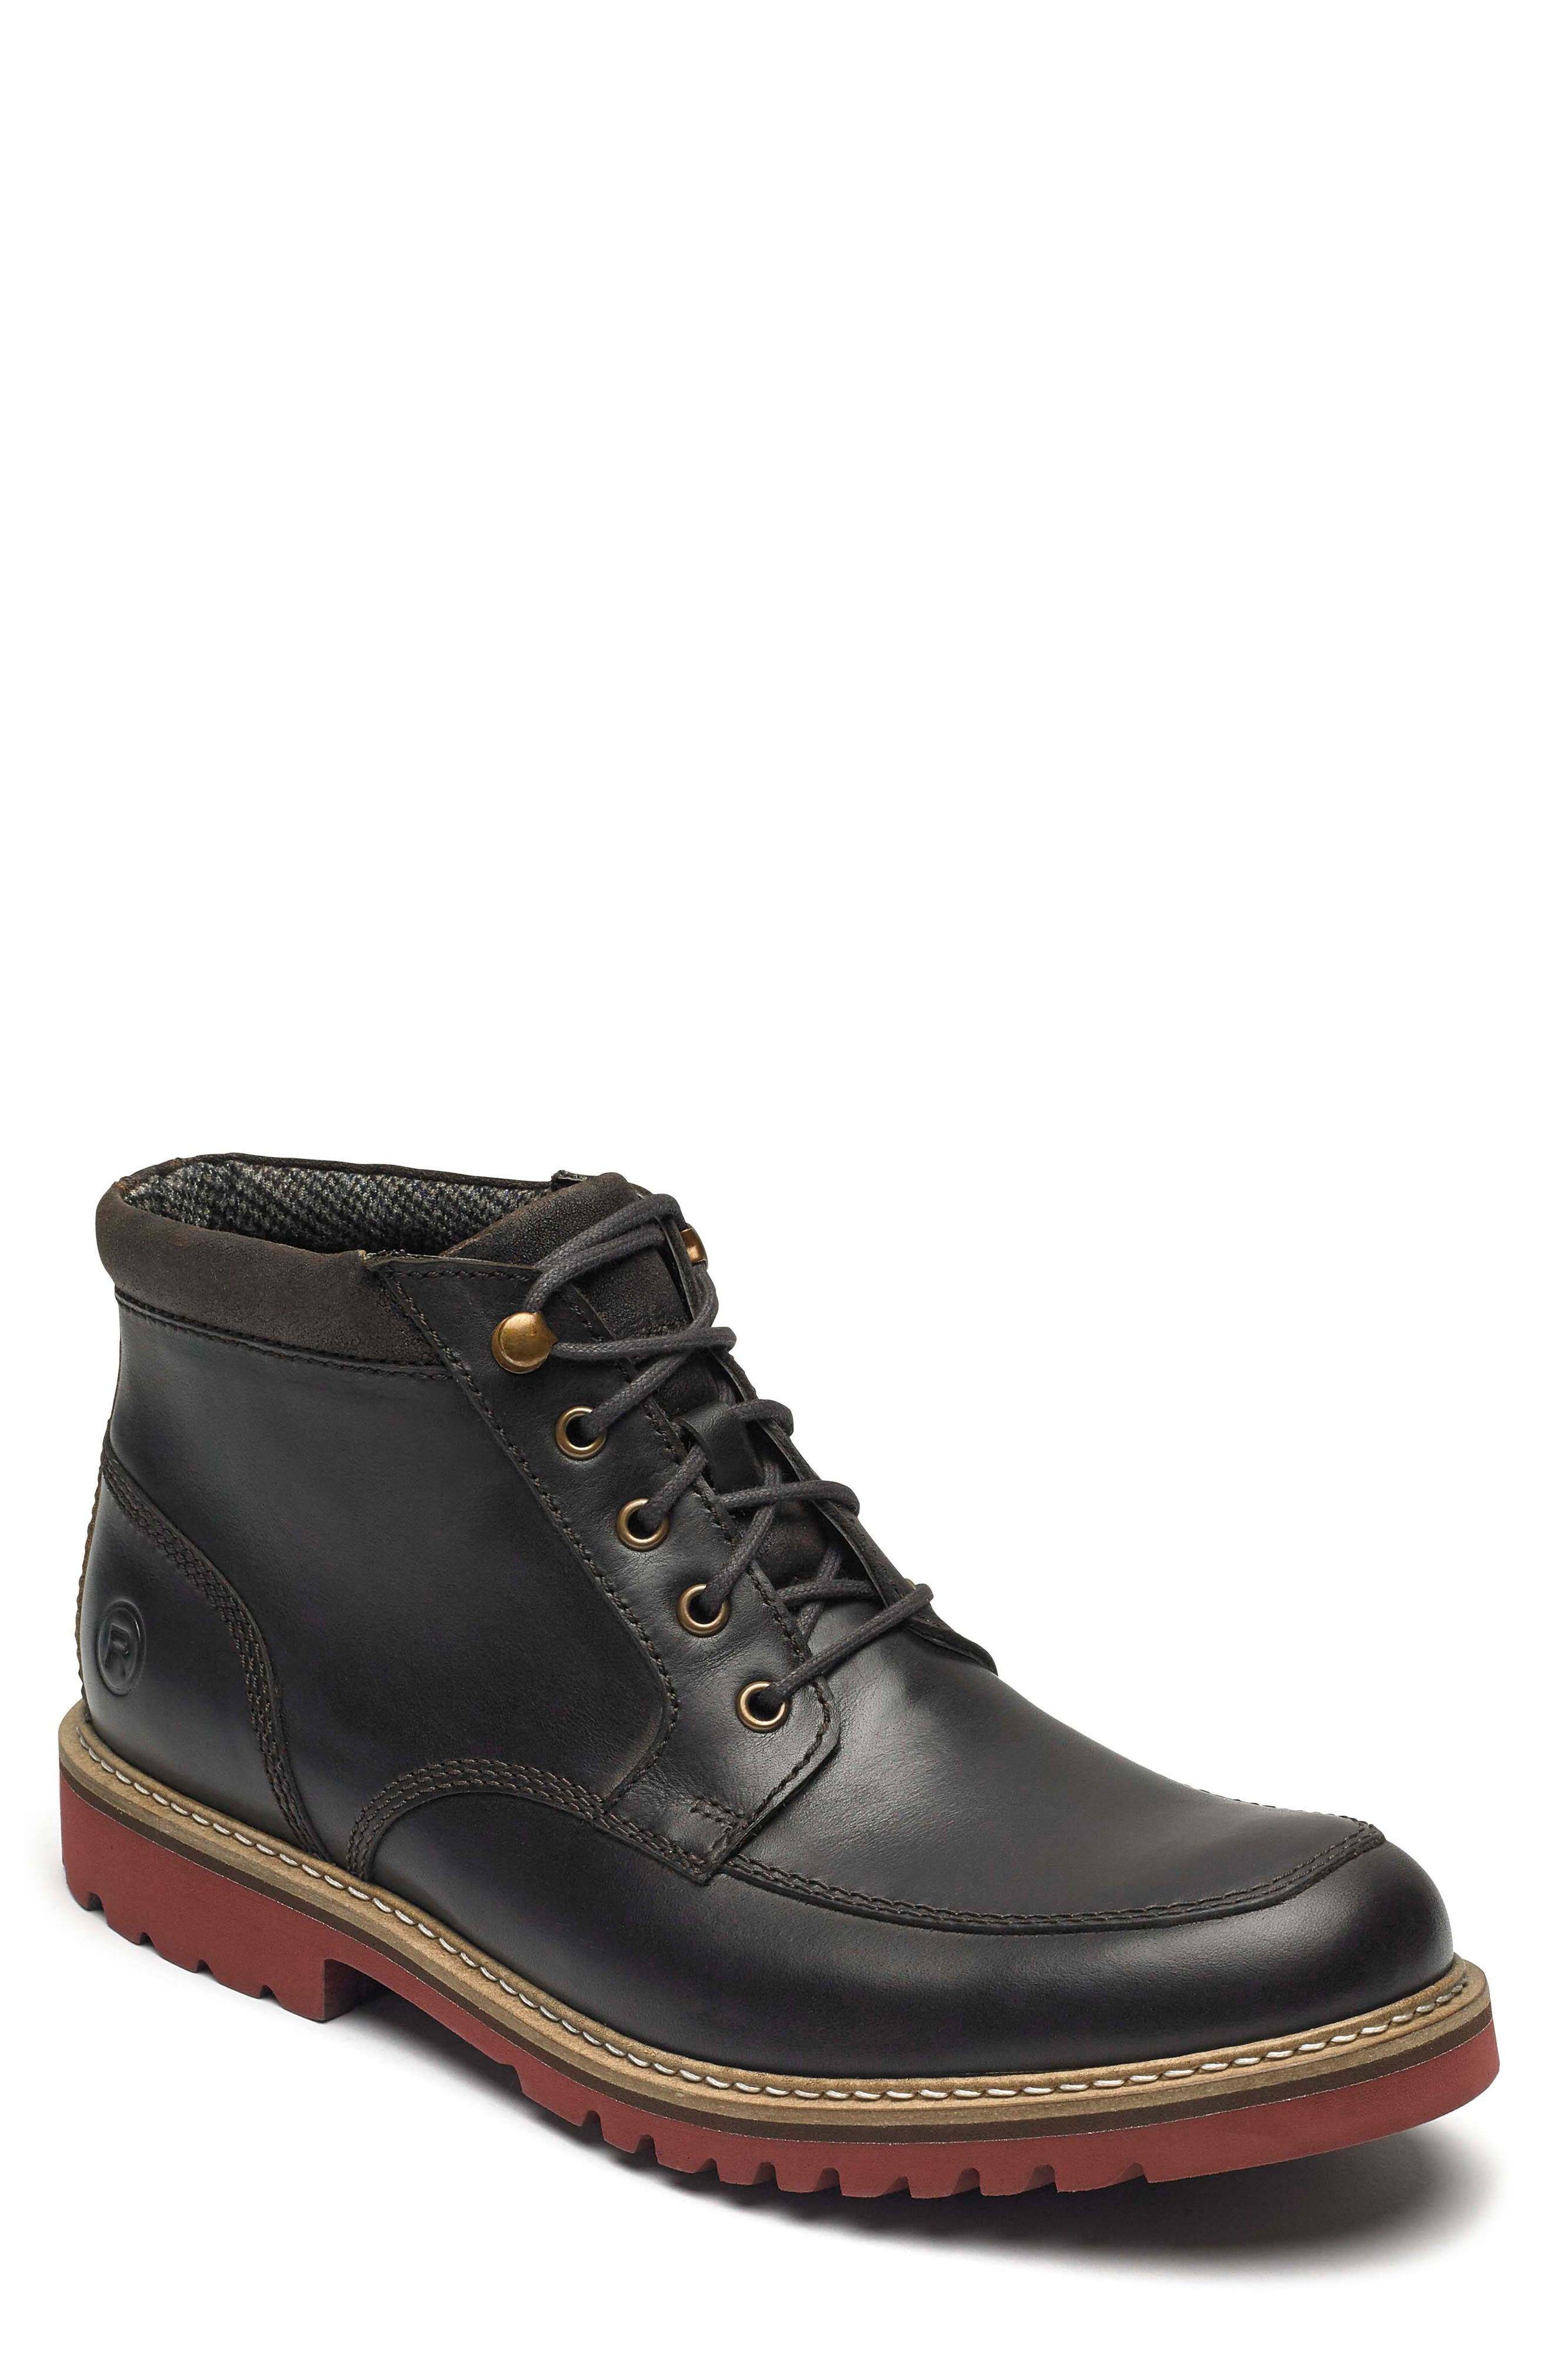 Rockport Marshall Moc Toe Boot- Brown